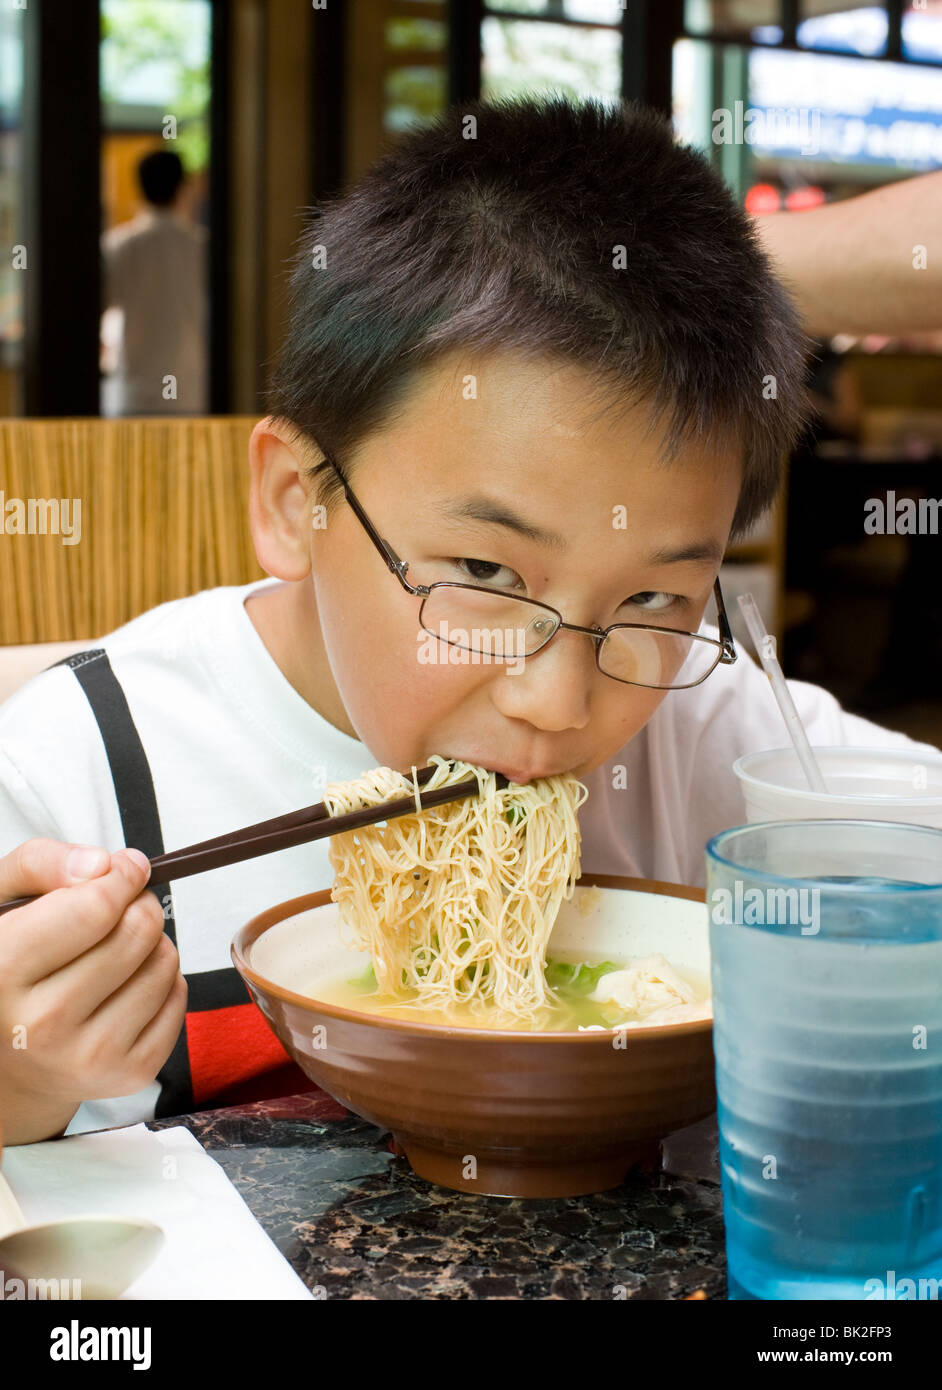 How to Eat Ramen with Chopsticks